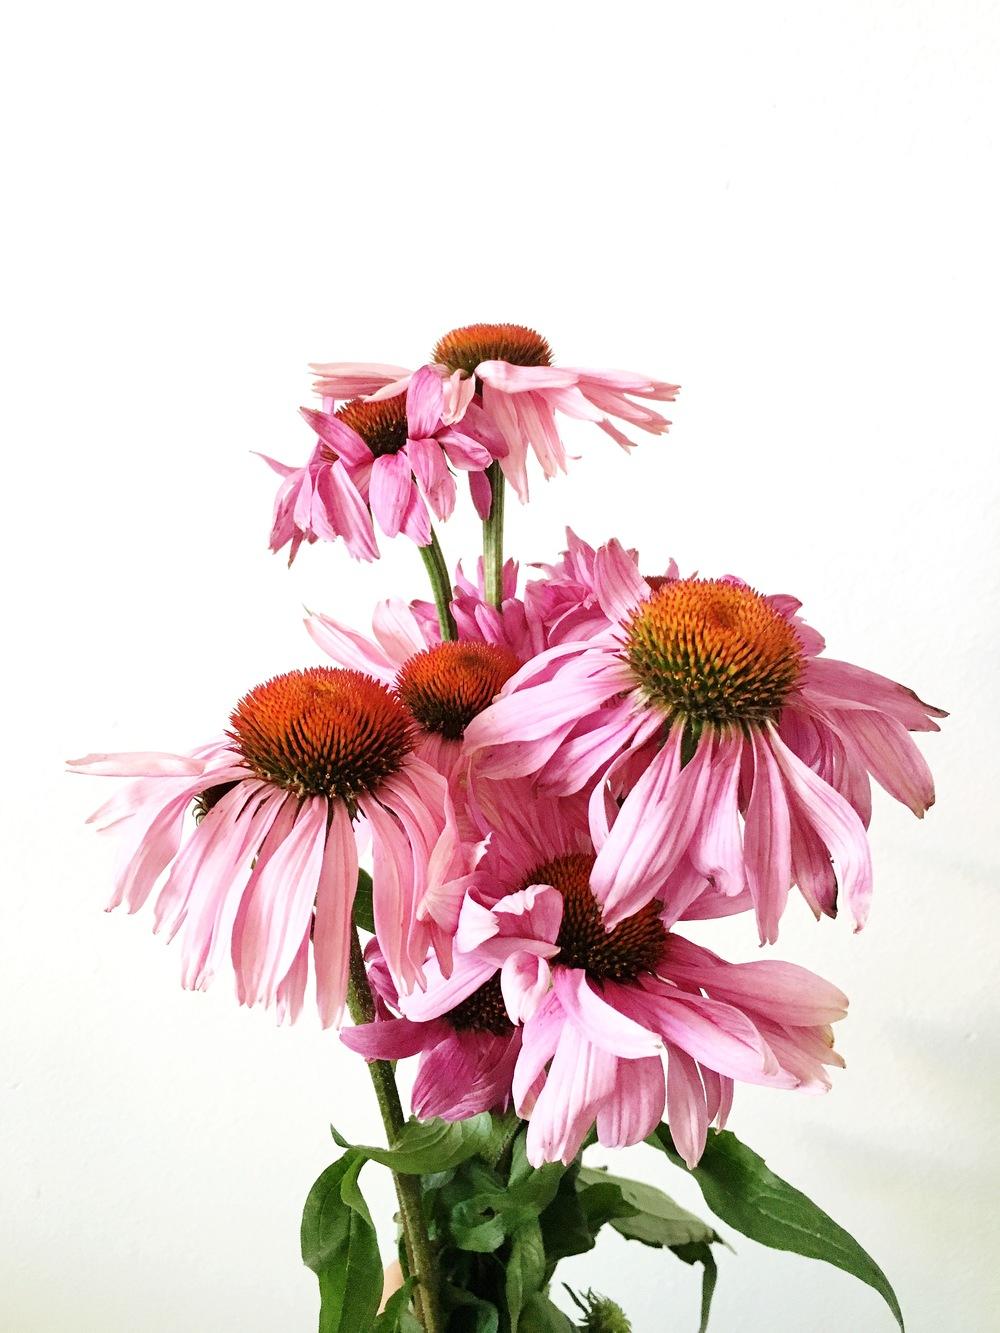 pinkconeflower.jpg